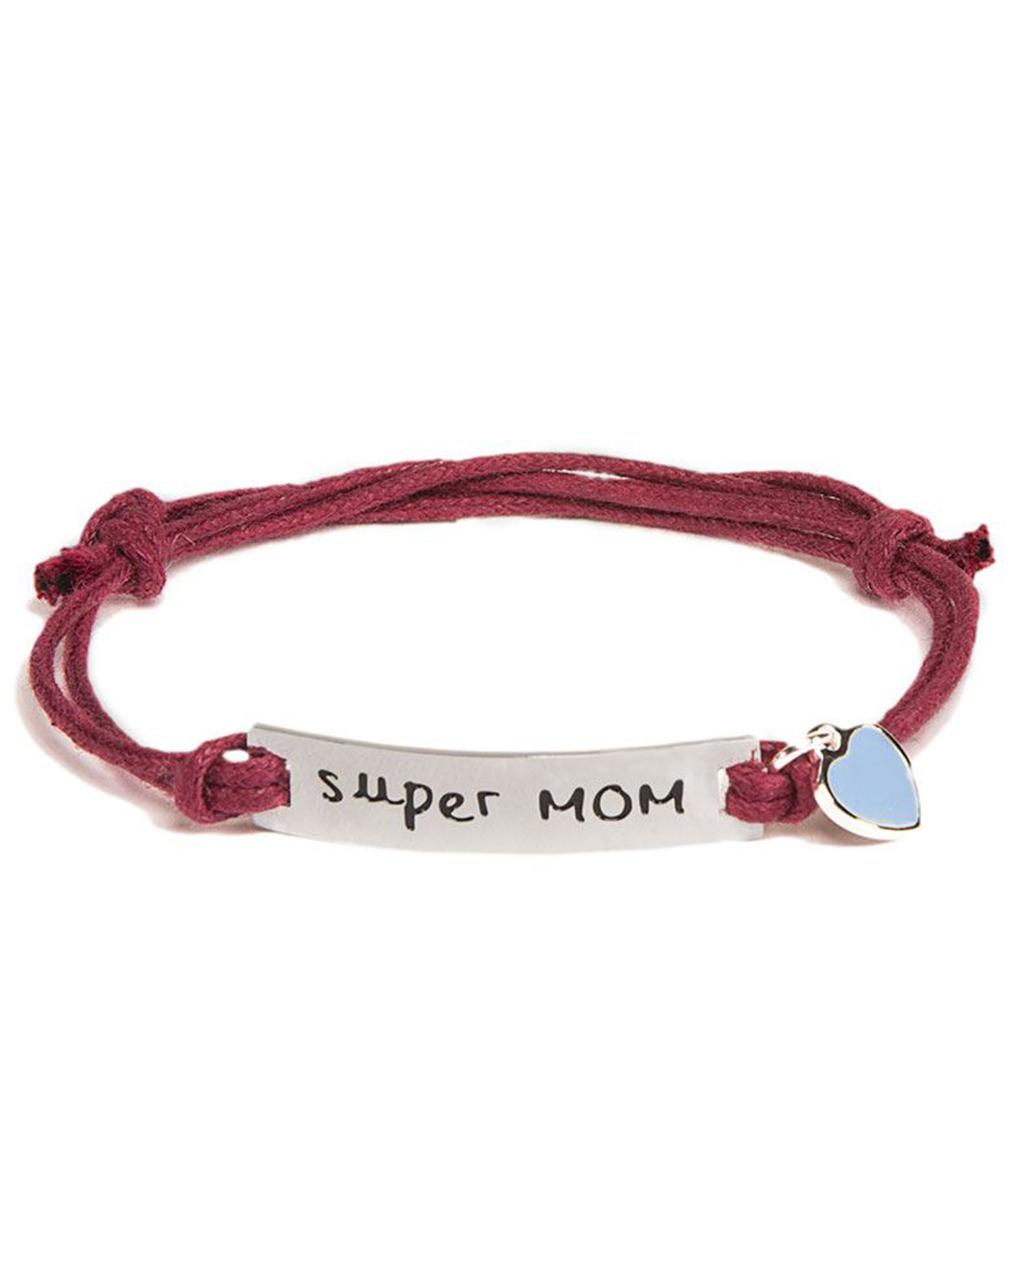 M'ami® tag super mom - M'Ami